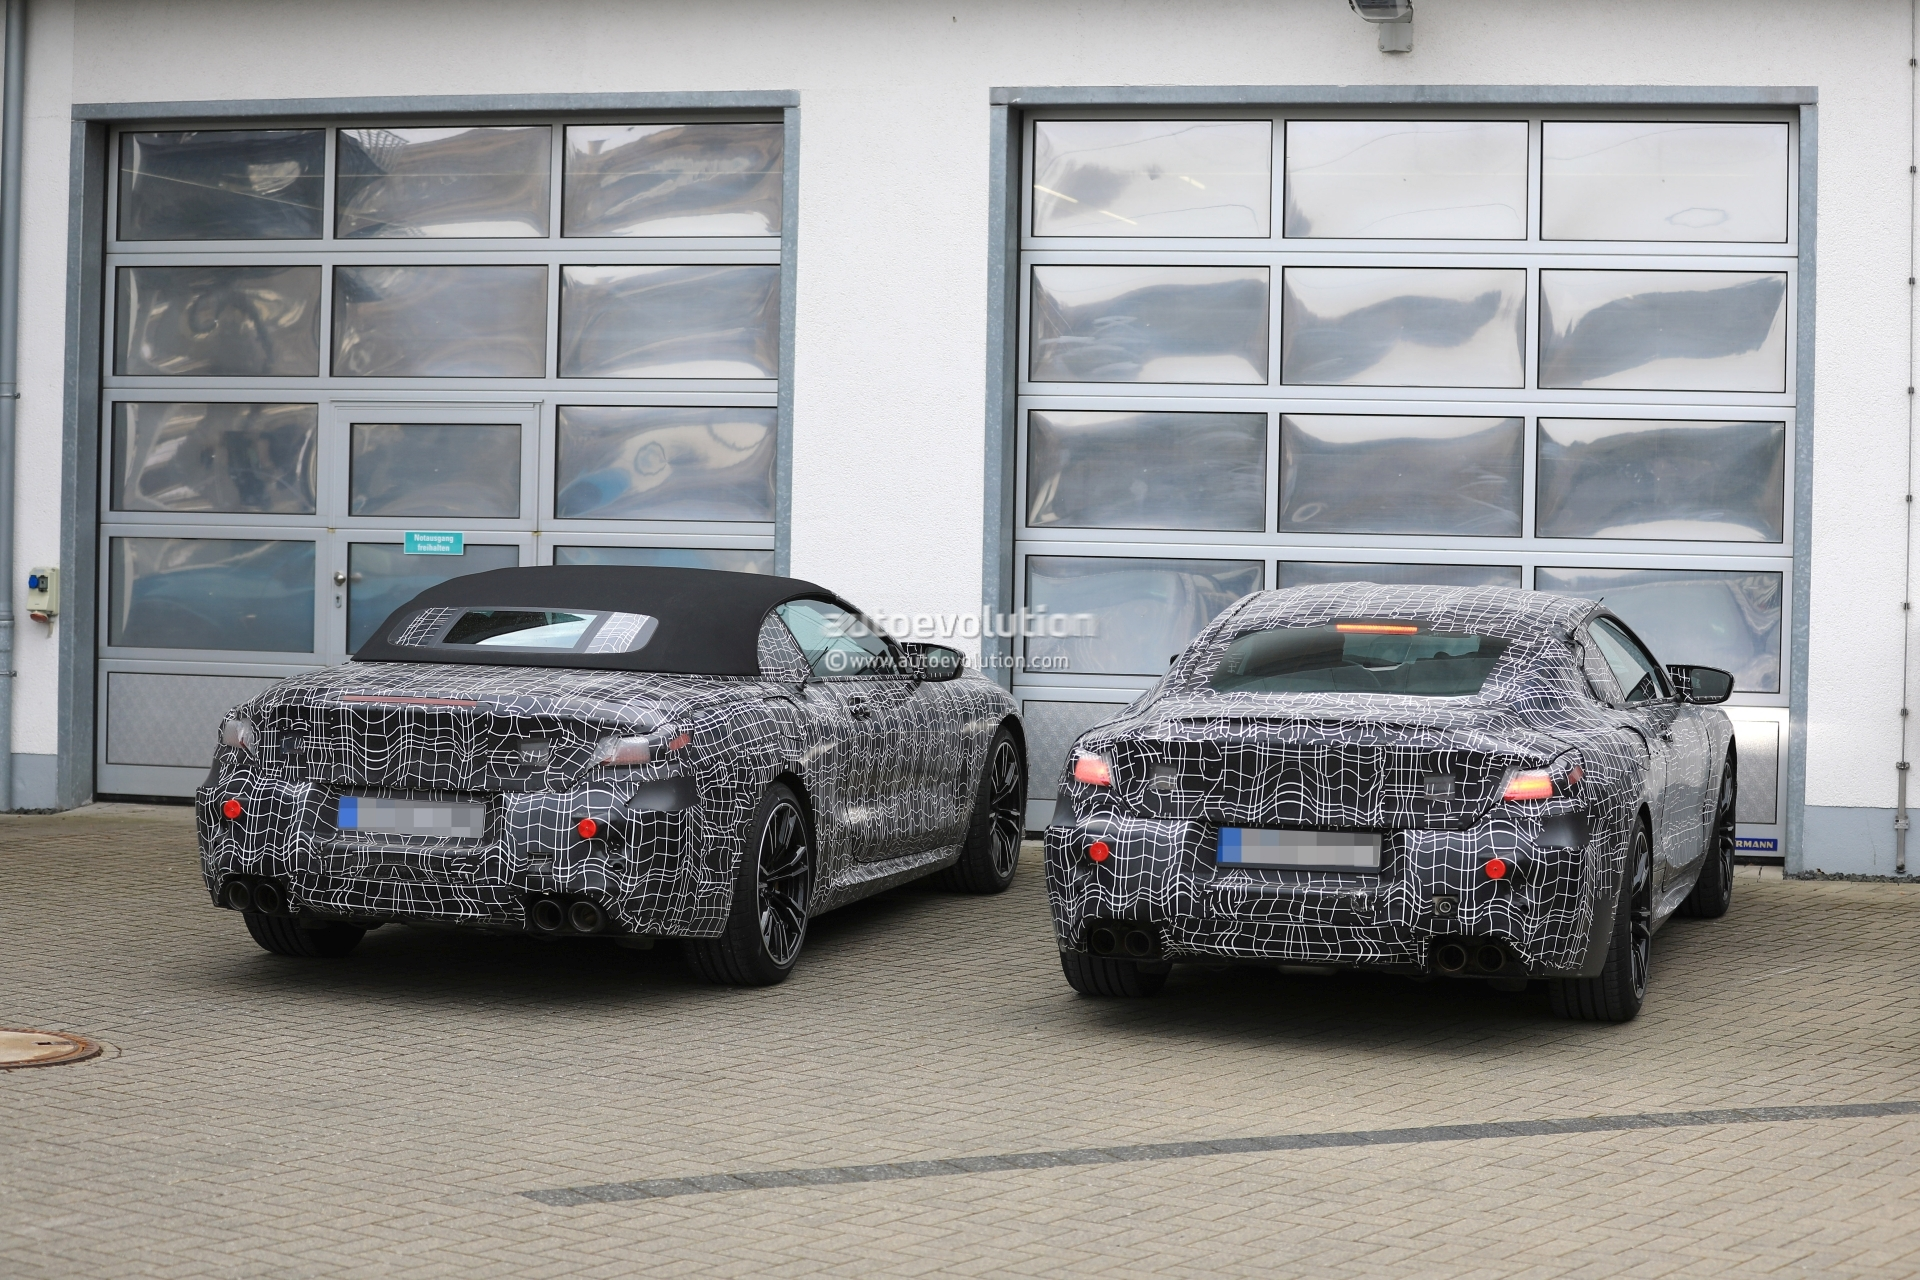 Spyshots 2019 Bmw M8 Coupe And Cabriolet Nurburgring Comparison